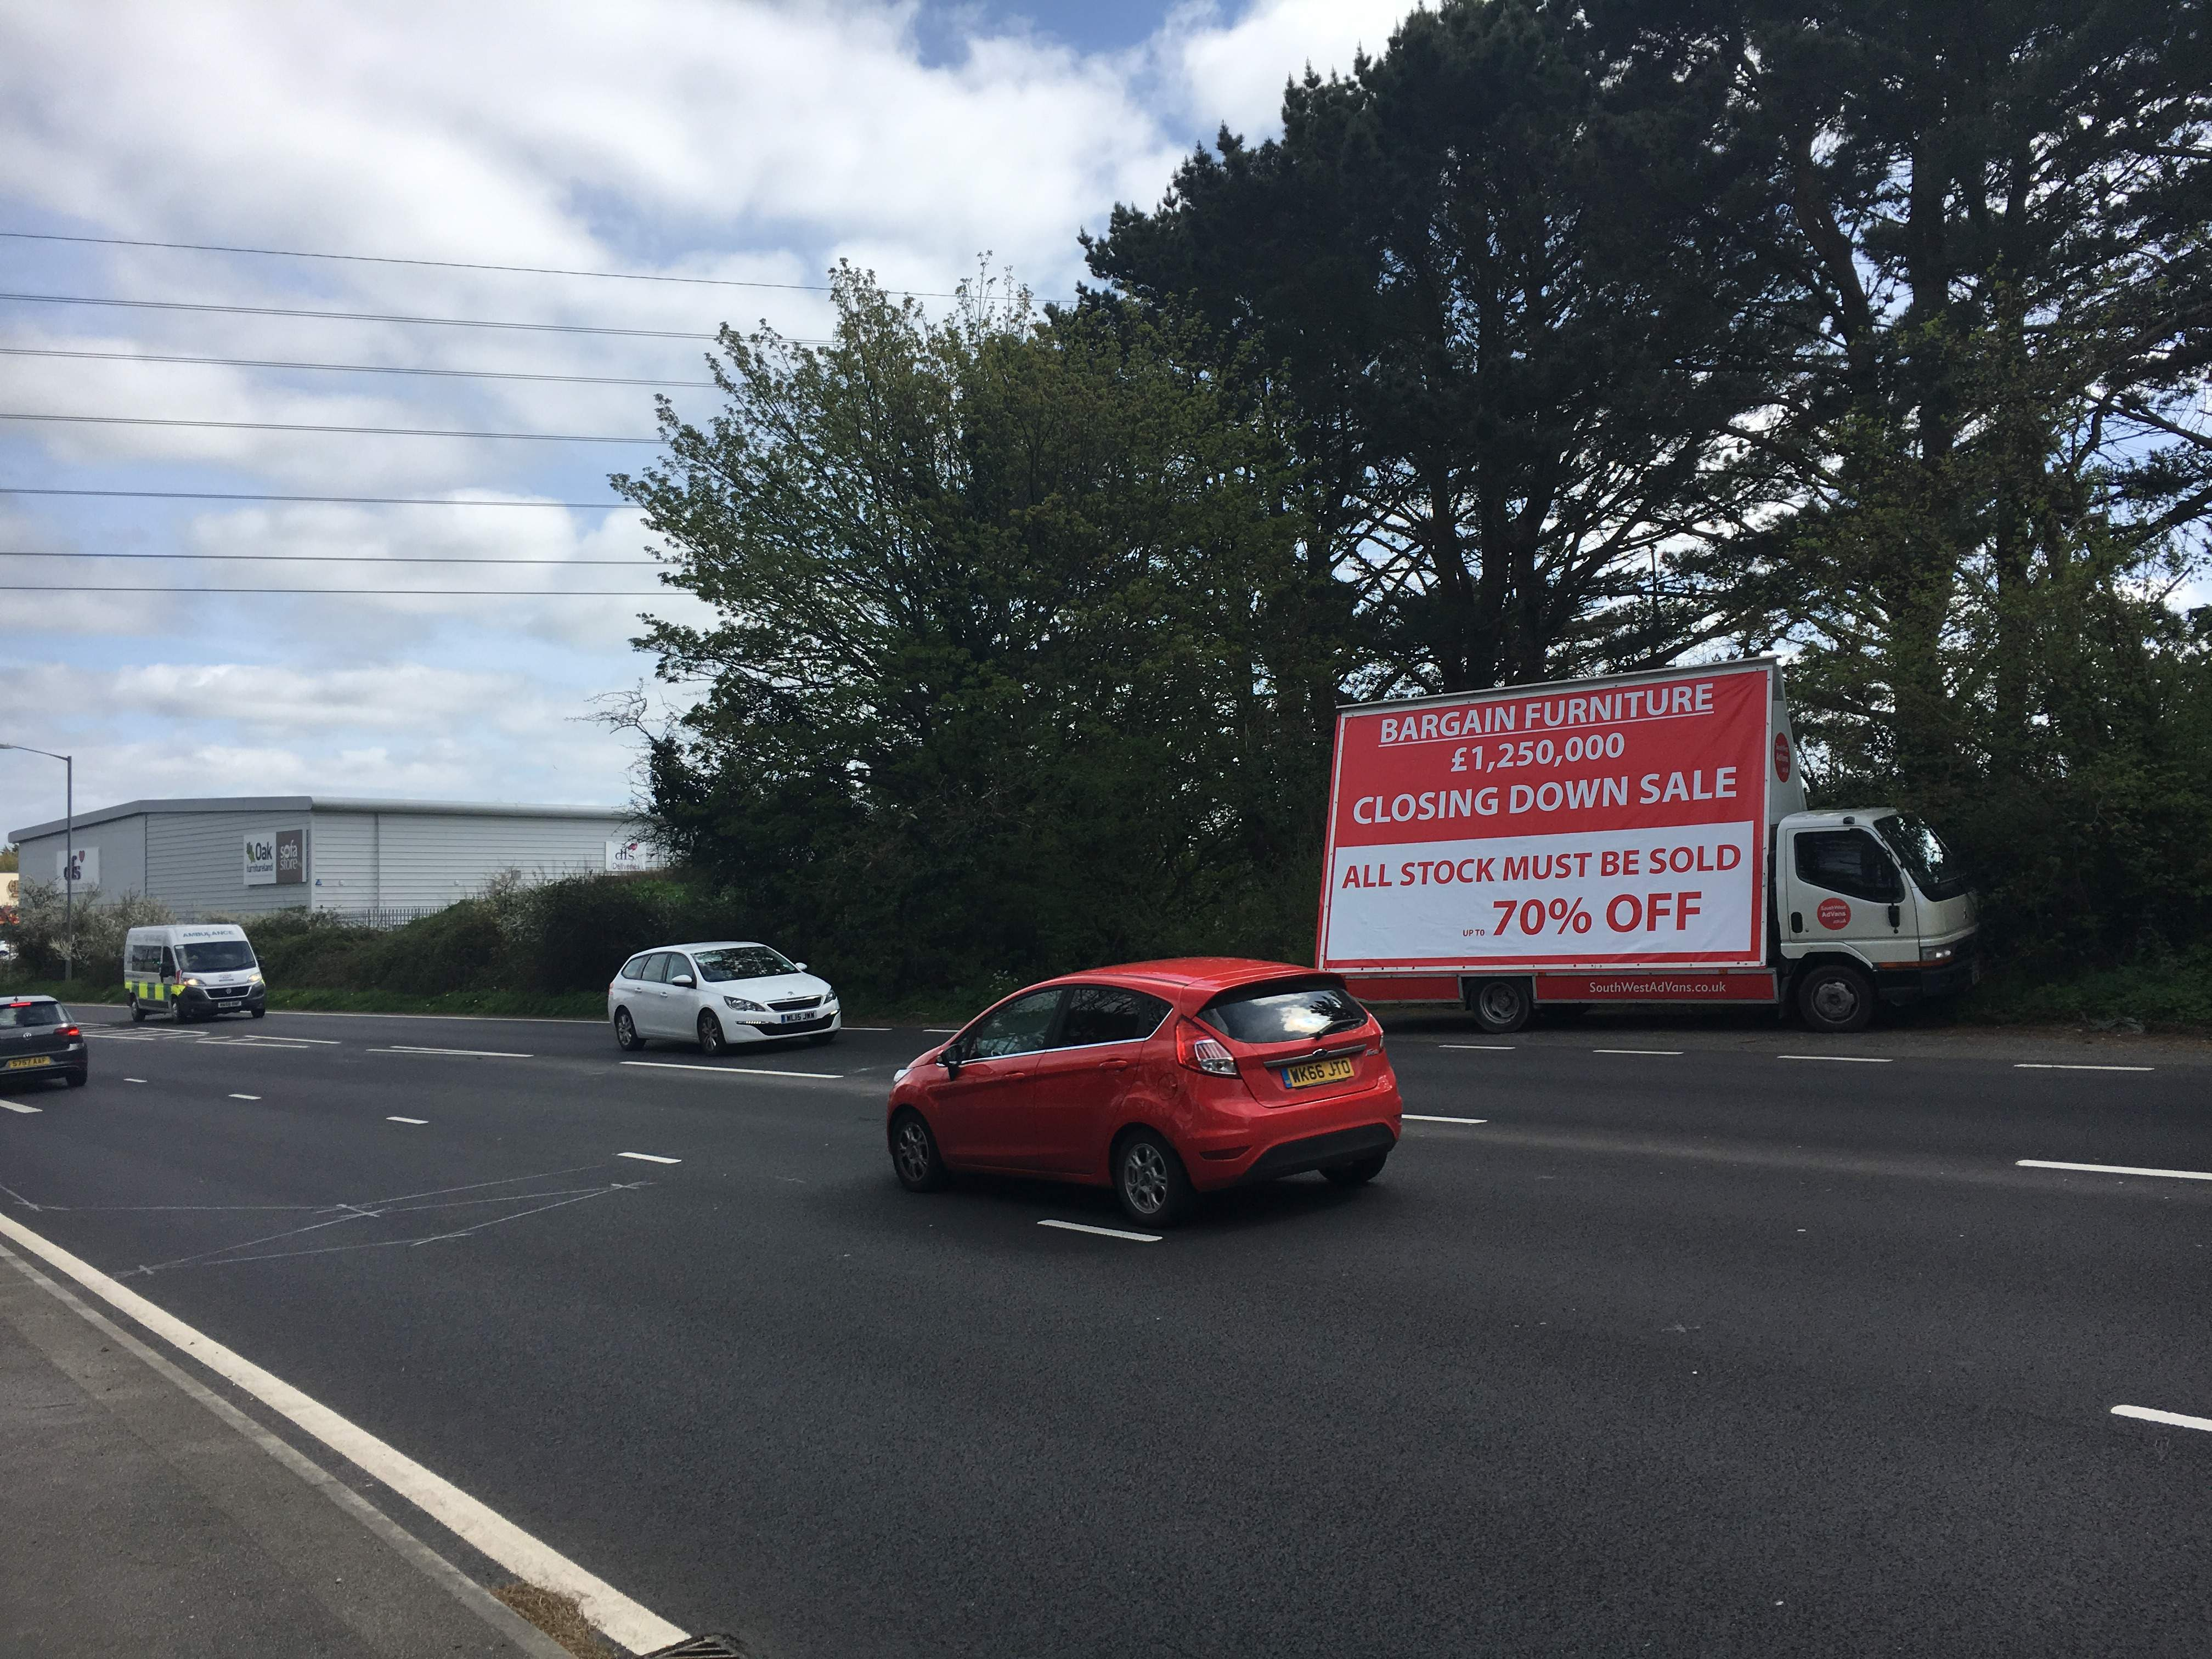 Deals On Wheels For Bargain Furniture